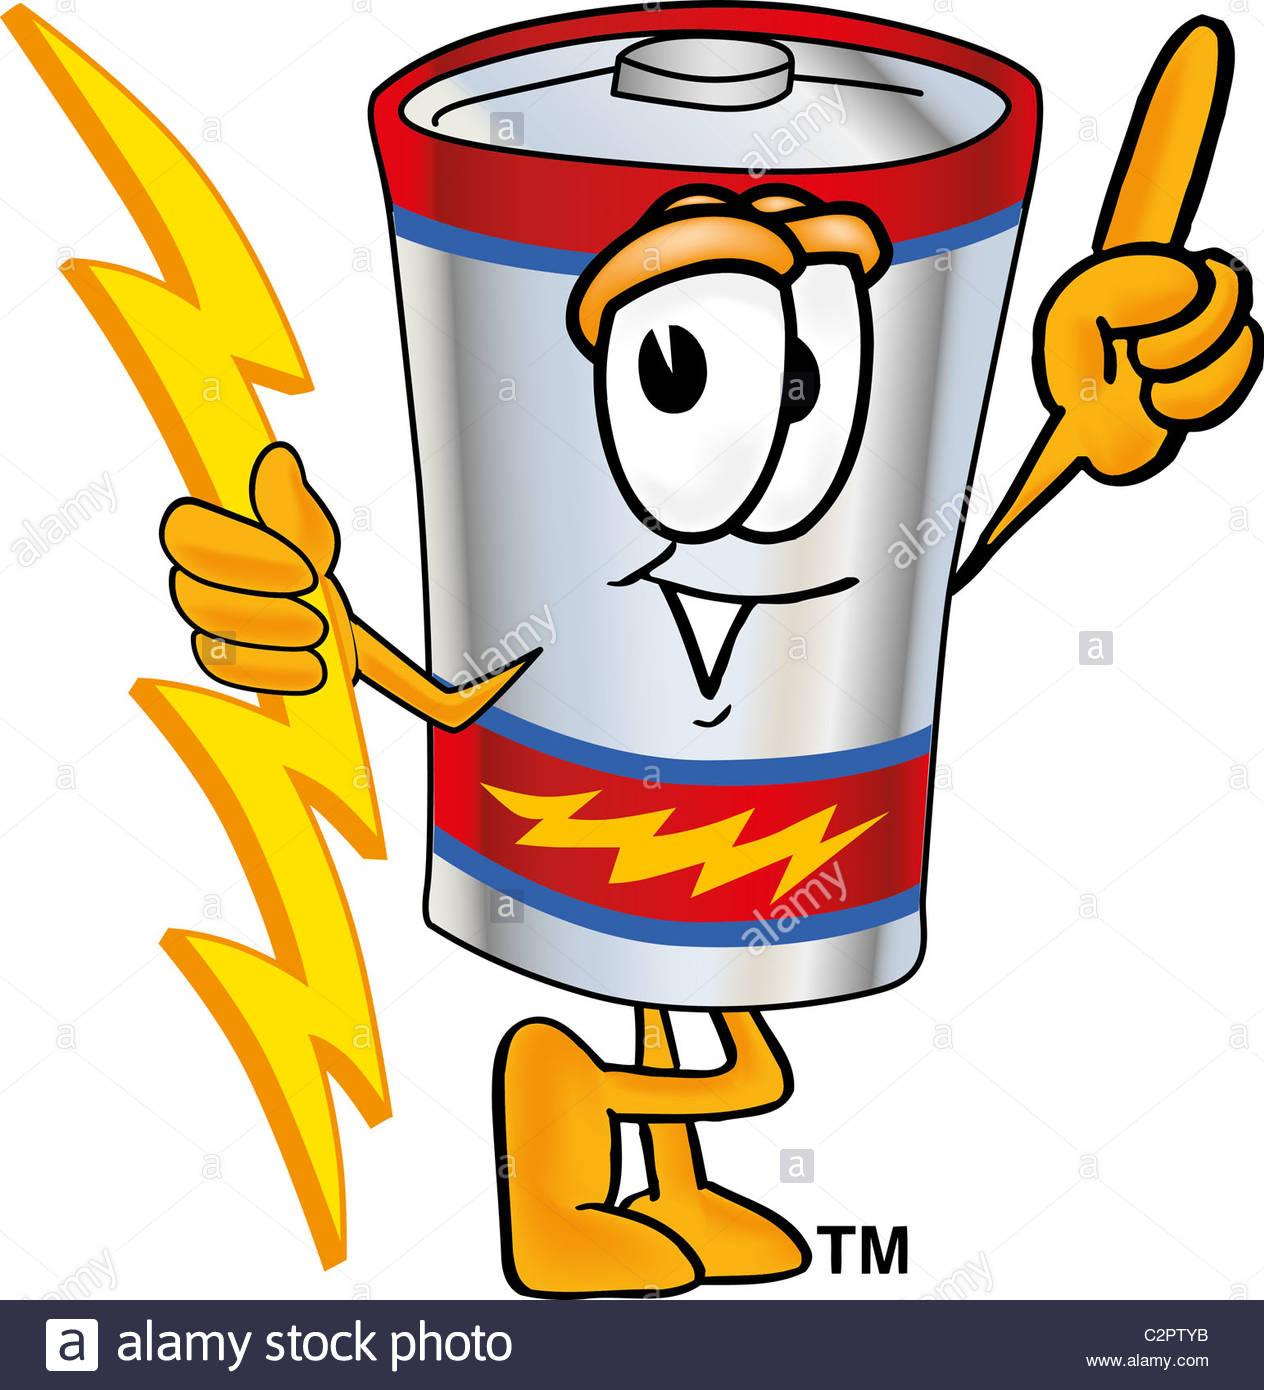 1264x1390 Cartoon Battery Mascot Holding A Lightning Bolt Stock Photo